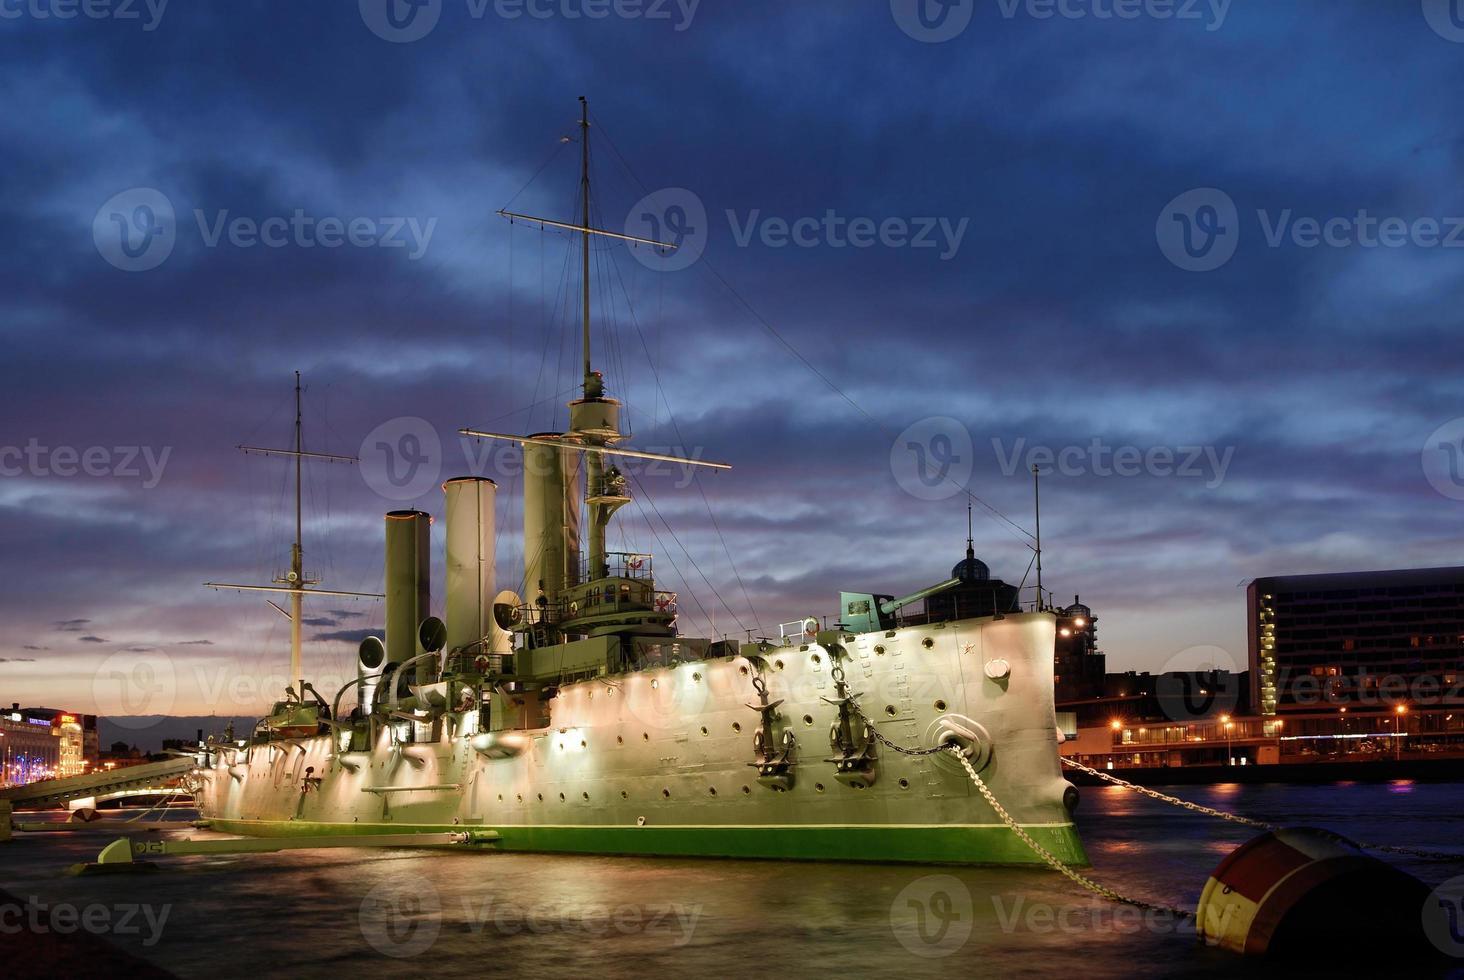 aurora cruiser i Saint-Petersburg foto